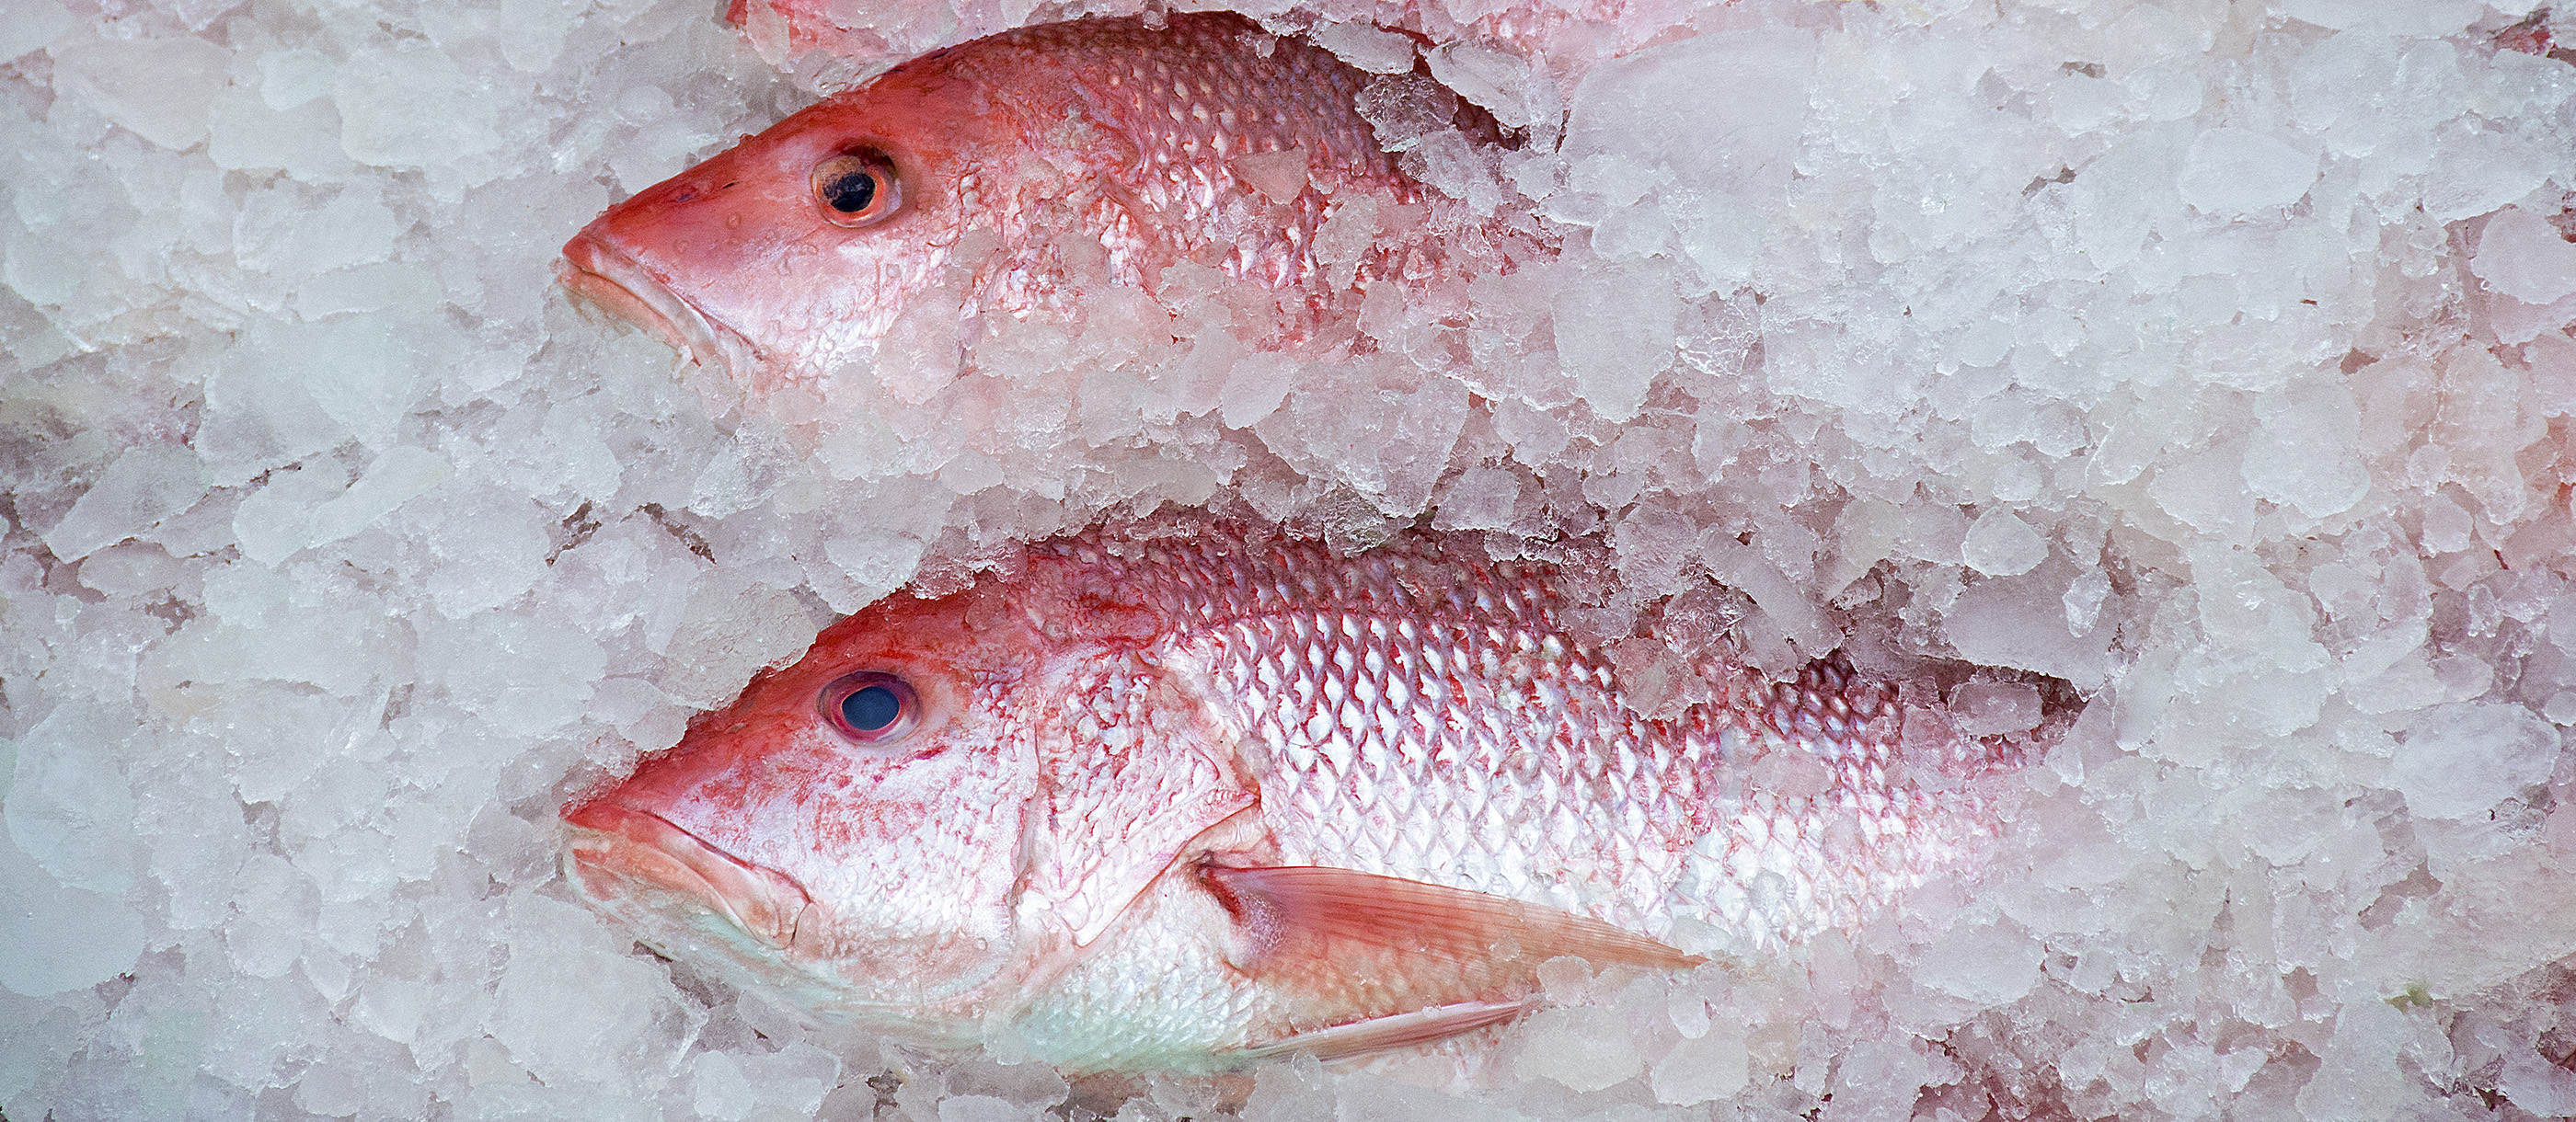 "Top Hegene Size 12 Top Colours Whitefish Whitefish Arctic Char Chiemsee Whitefish Viol!/"""